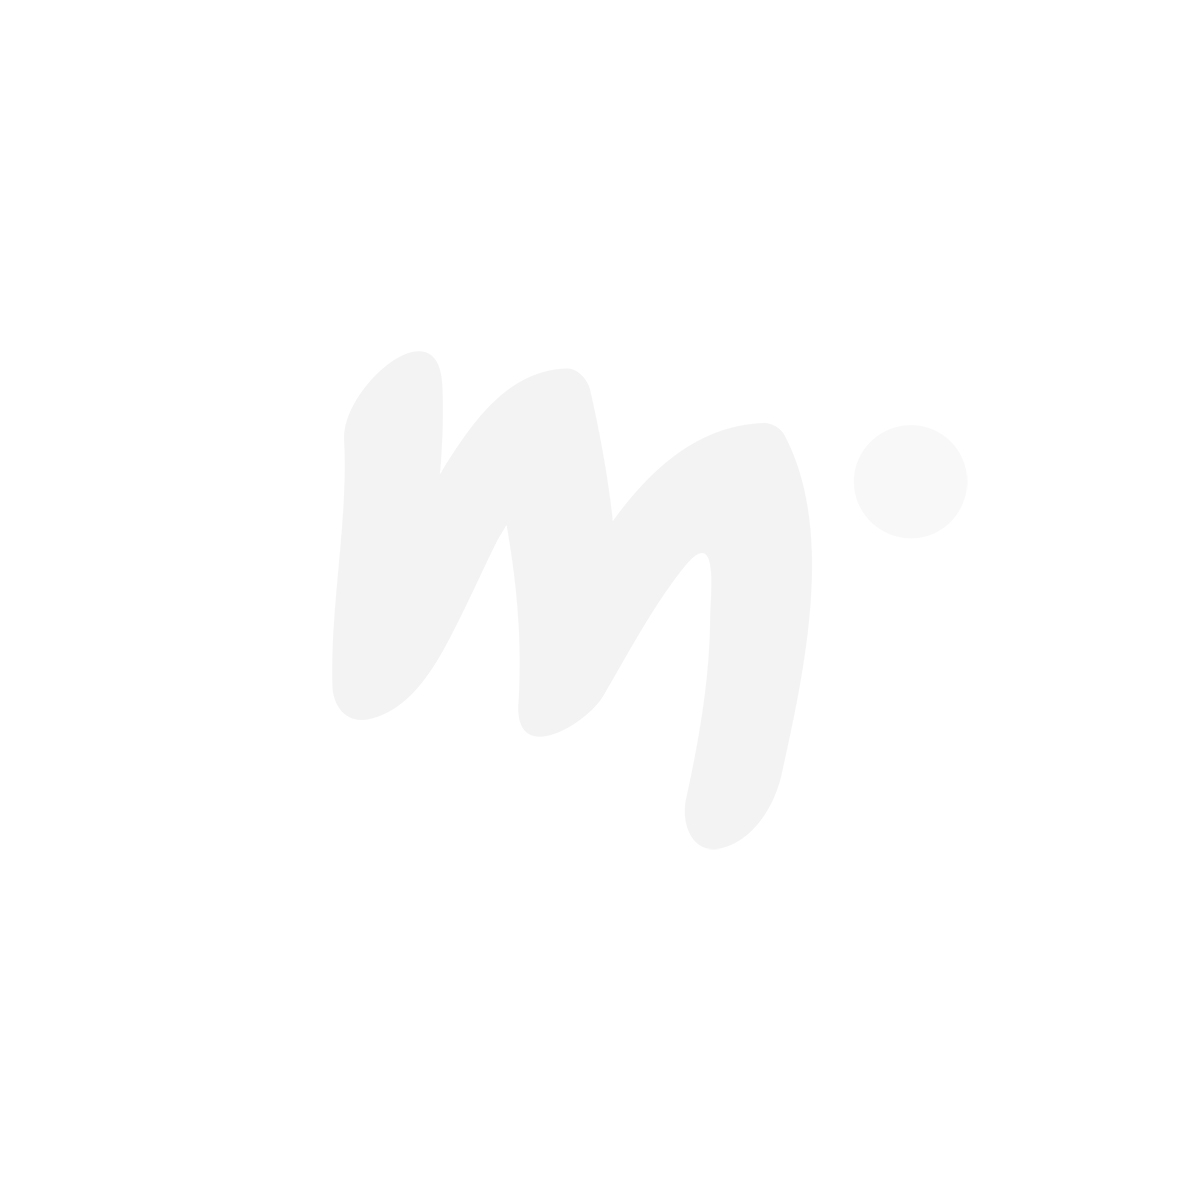 Peppi Pitkätossu Huvikummussa-body oranssi